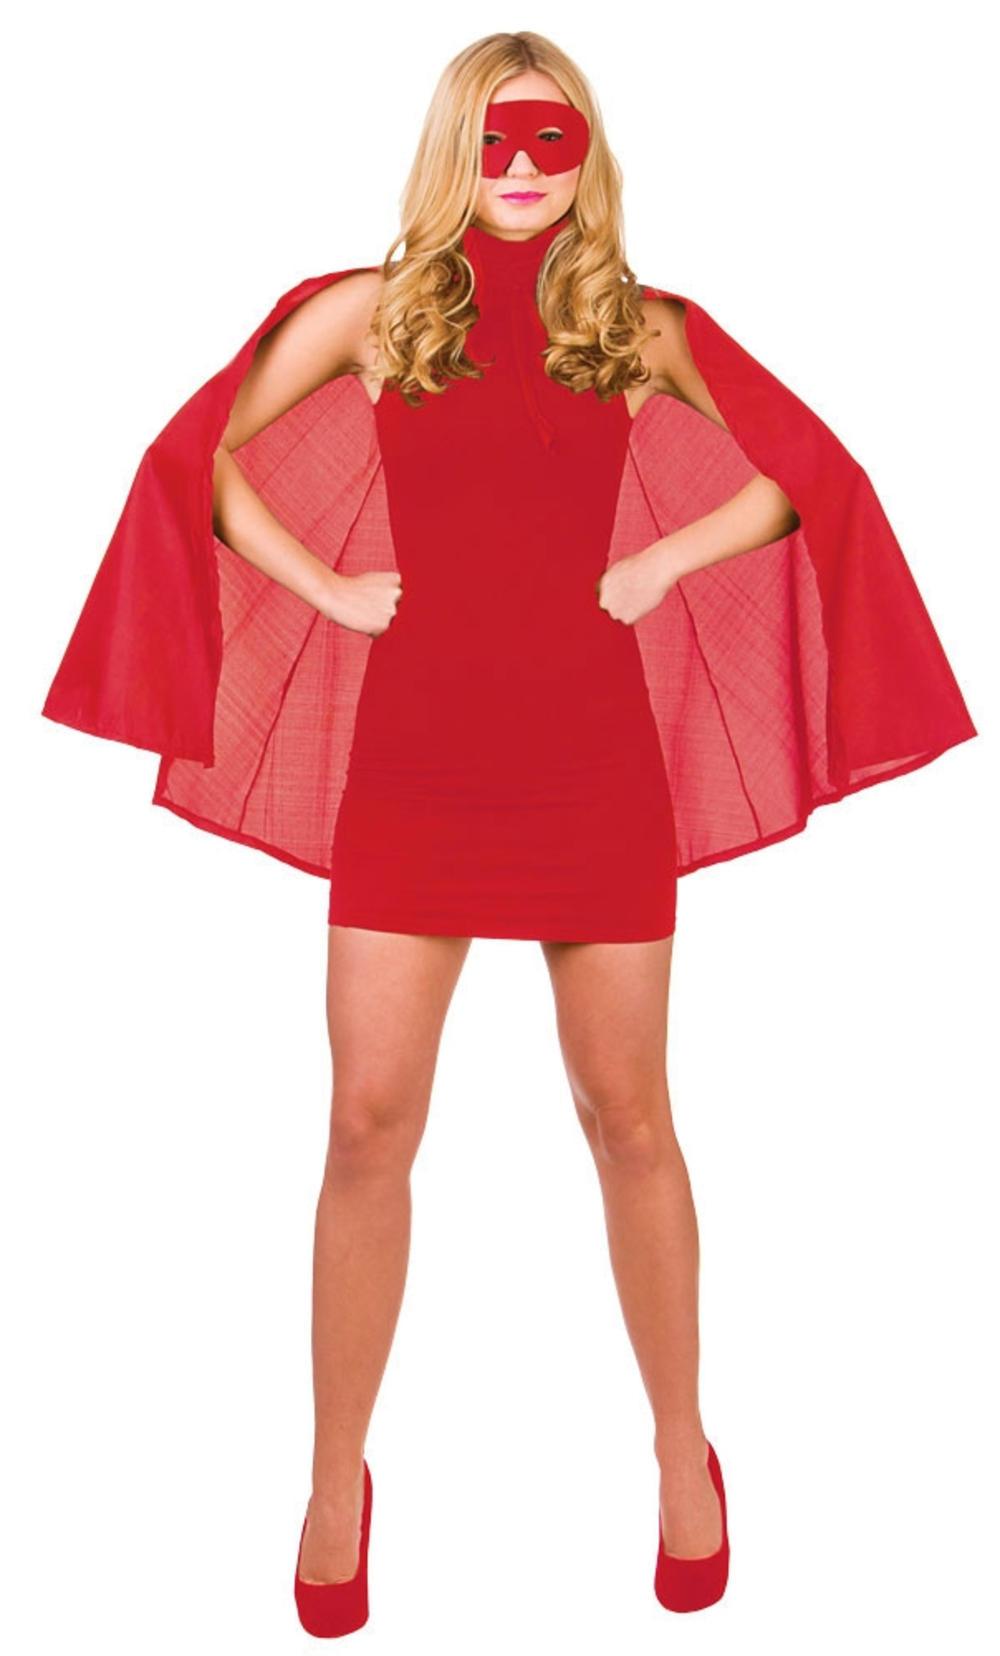 Adults Red Superhero Cape & Mask Costume Accessory